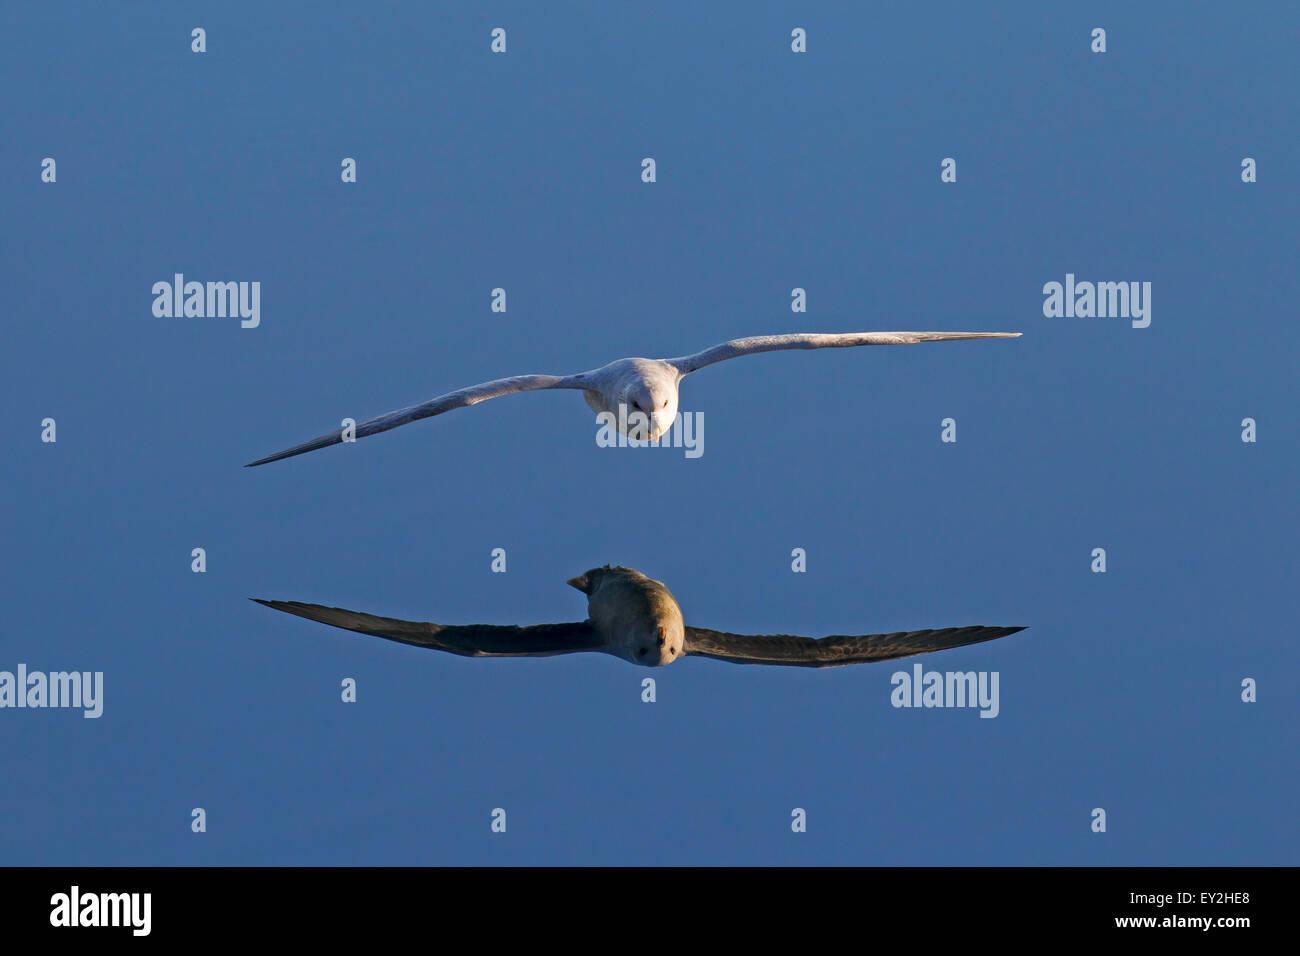 Northern fulmar / Arctic fulmar (Fulmarus glacialis) gliding above the sea water - Stock Image